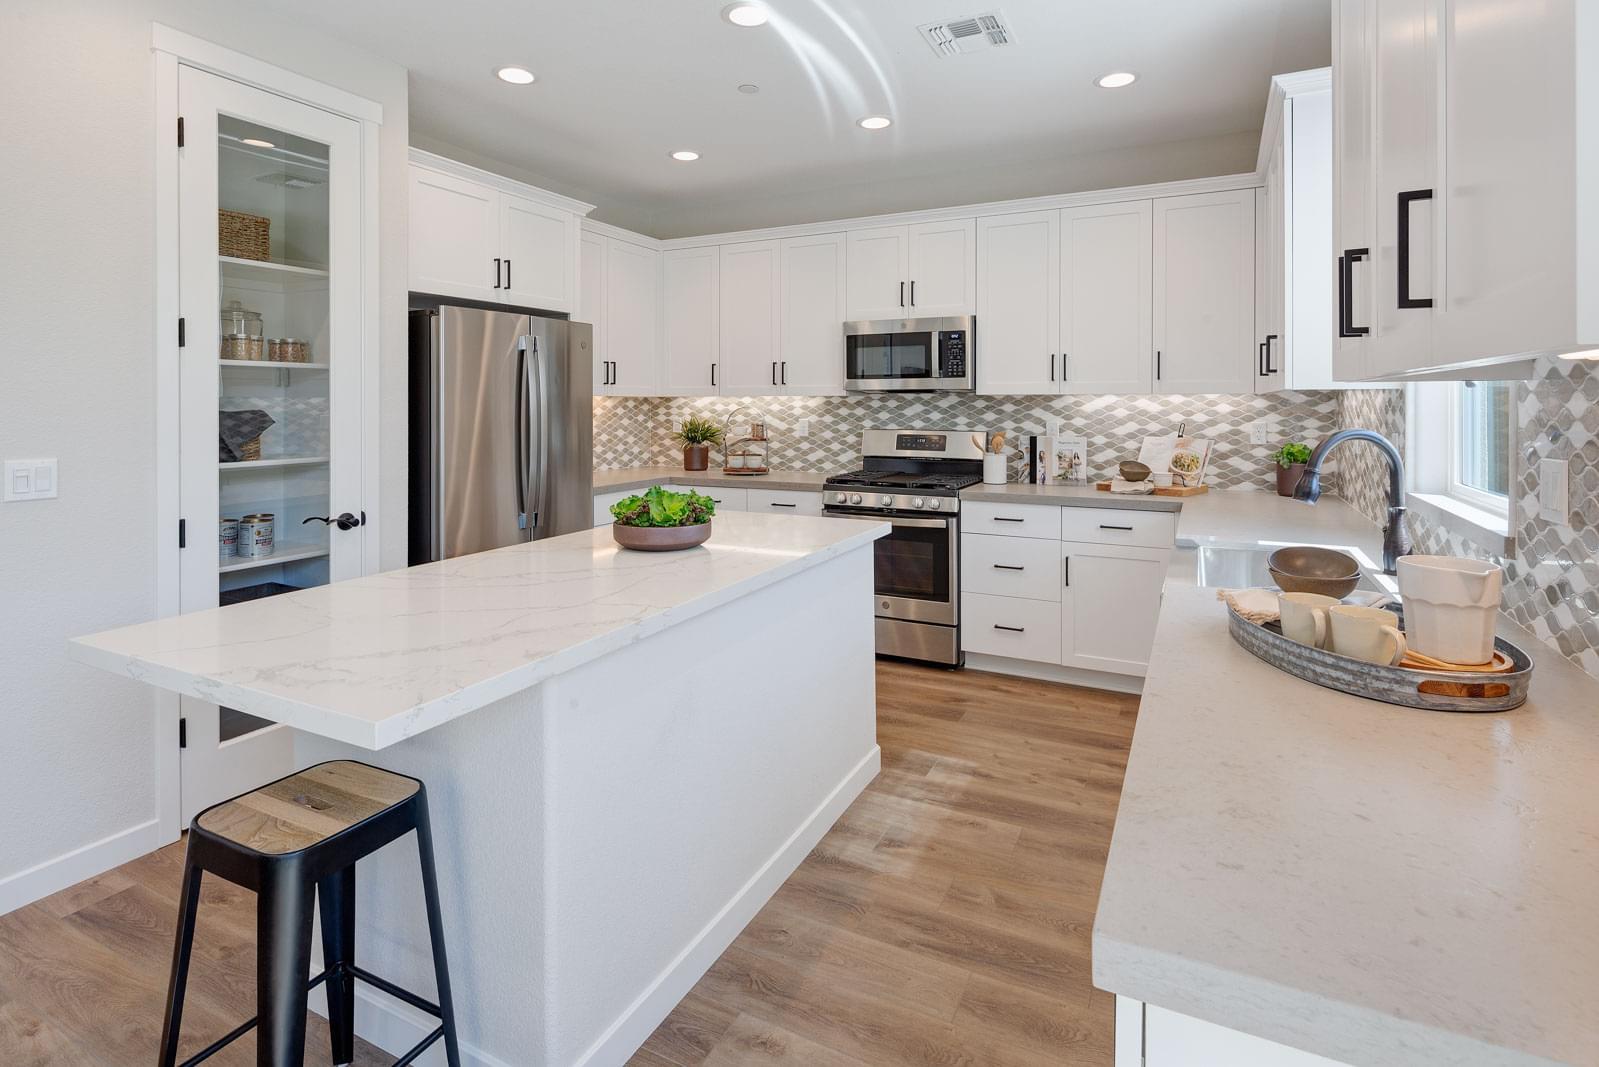 Residence 3 Kitchen